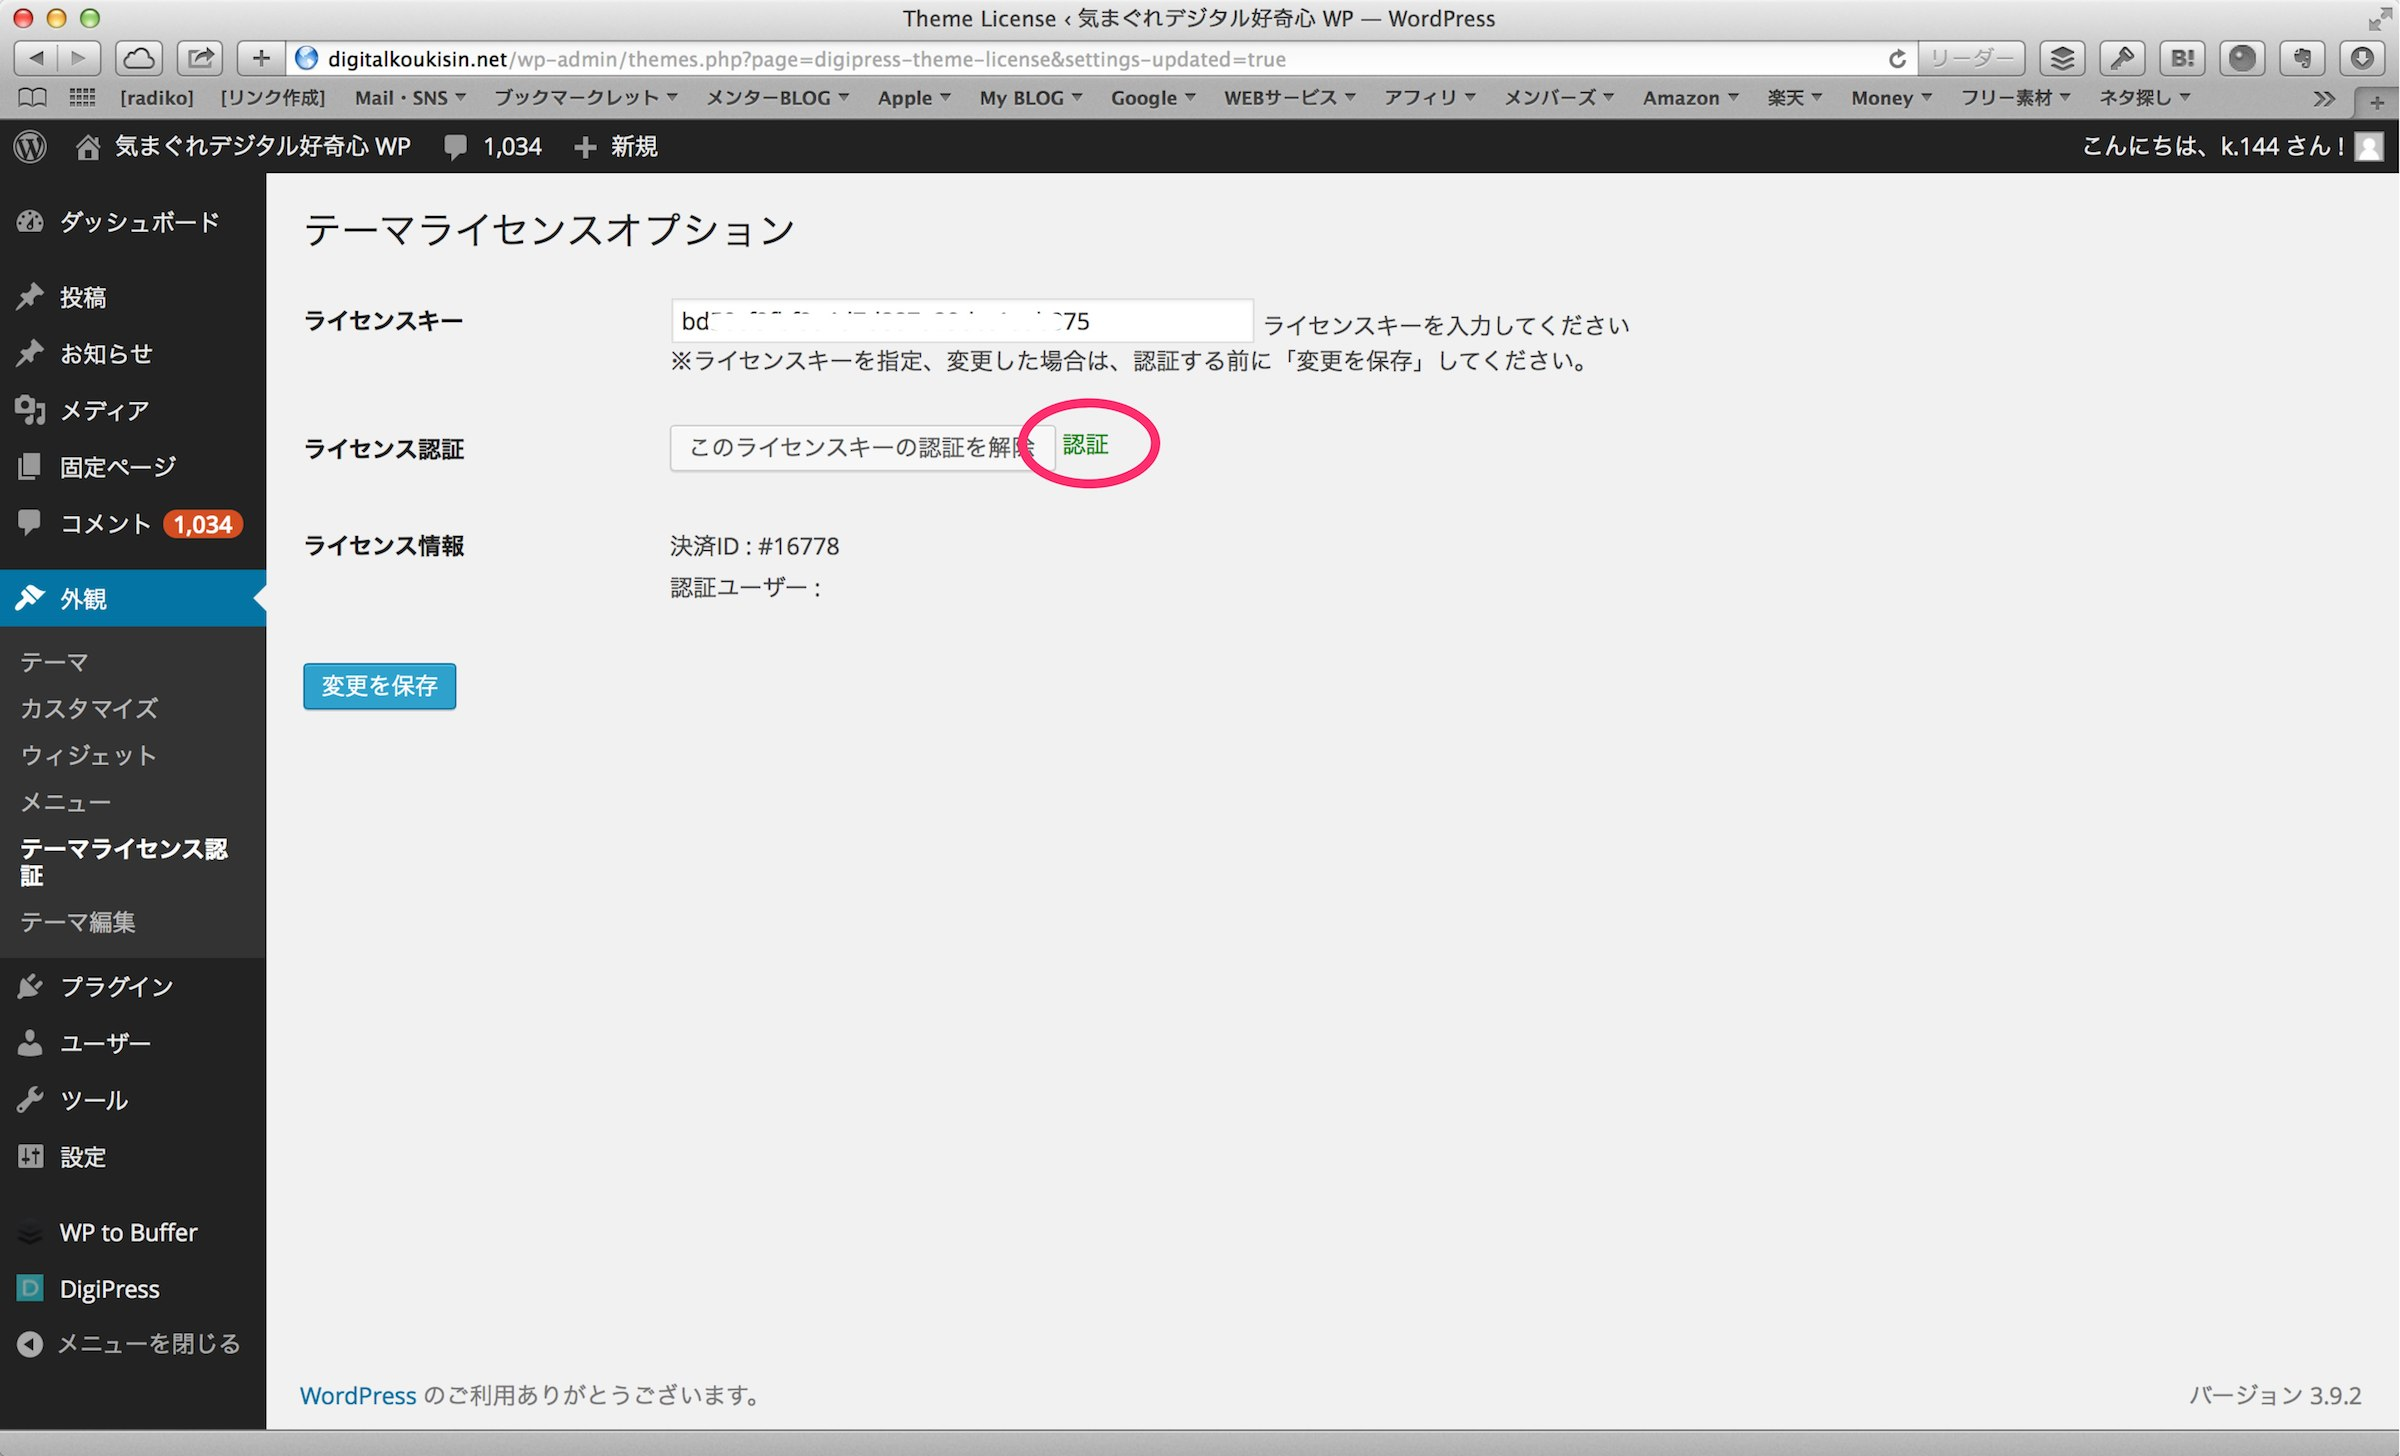 Theme License ‹ 気まぐれデジタル好奇心 WP — WordPress-2